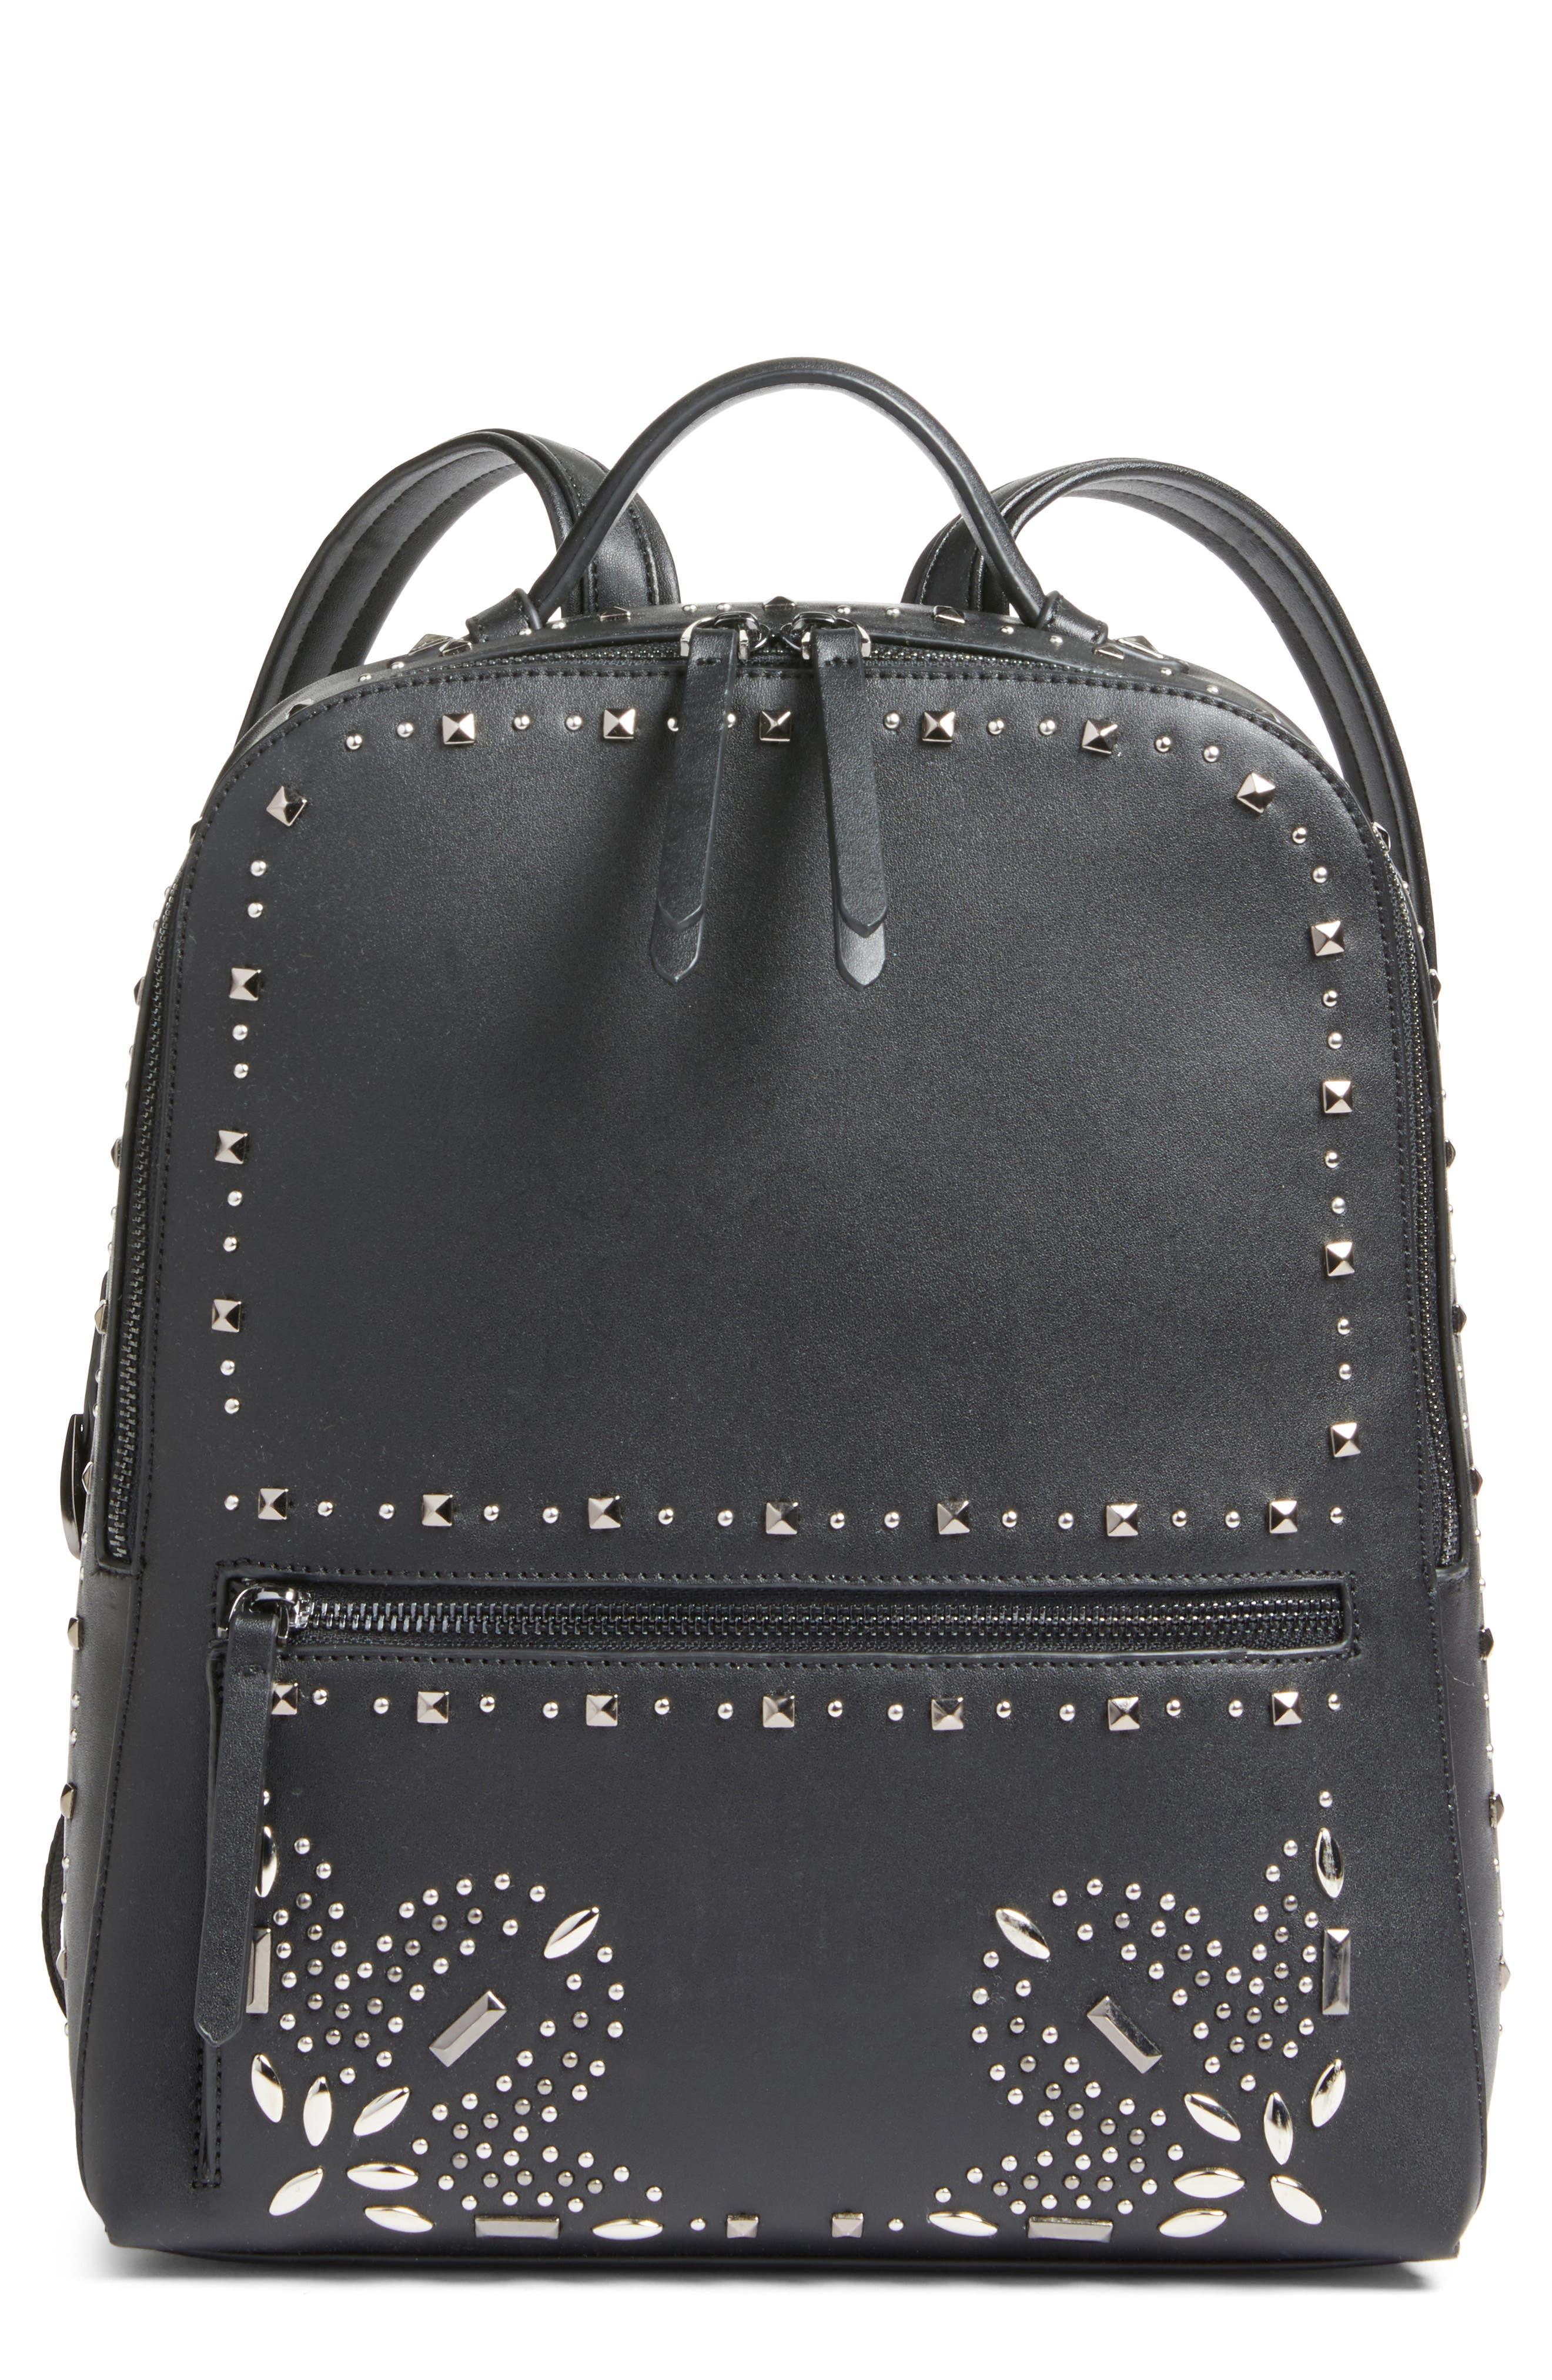 Chelsea28 Brooke Embellished Faux Leather Backpack